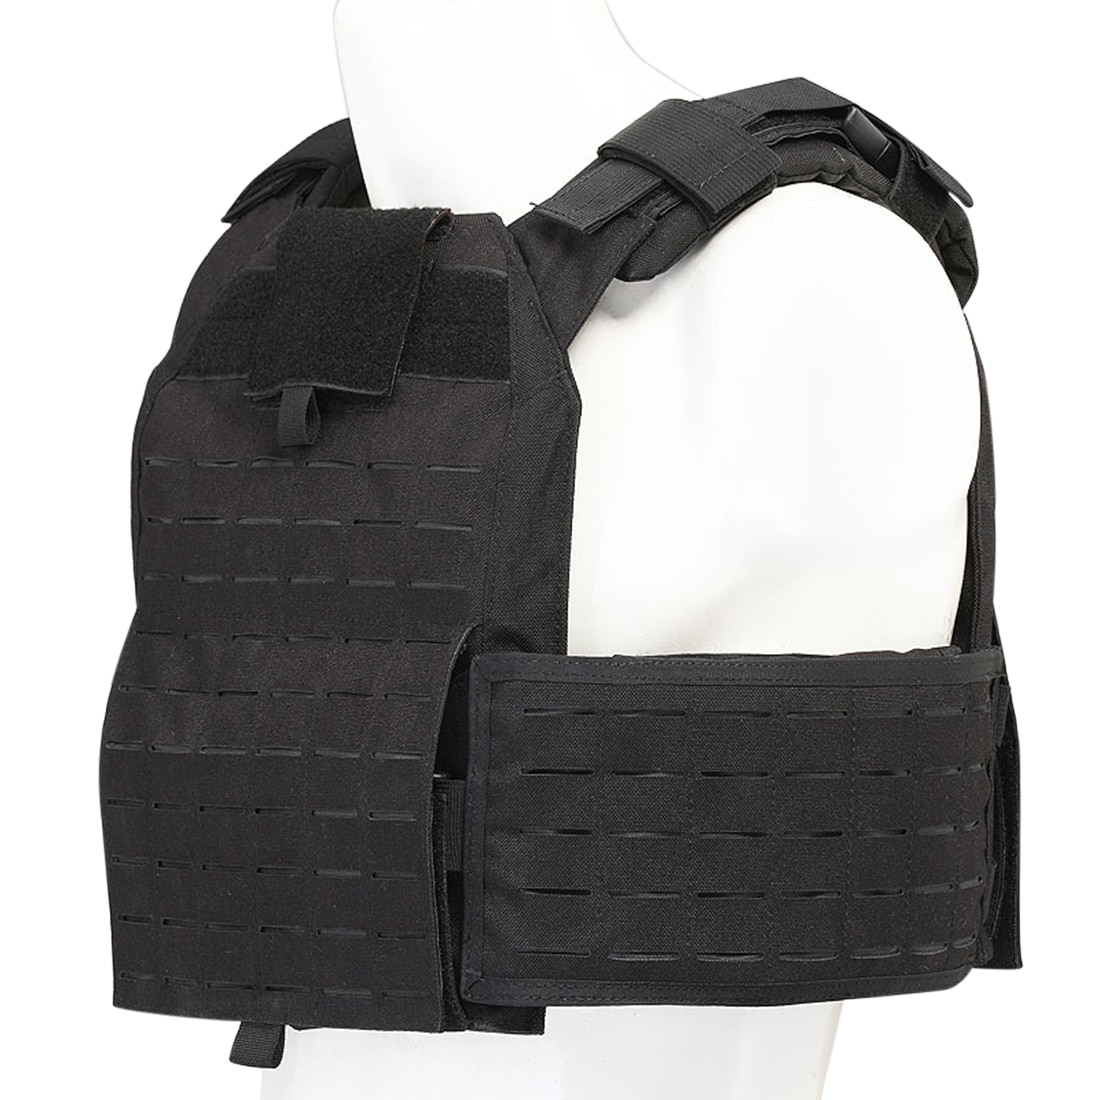 Military Plate Carrier Quick Release Tactical Vest Cordura Modular Combat Vest - Black